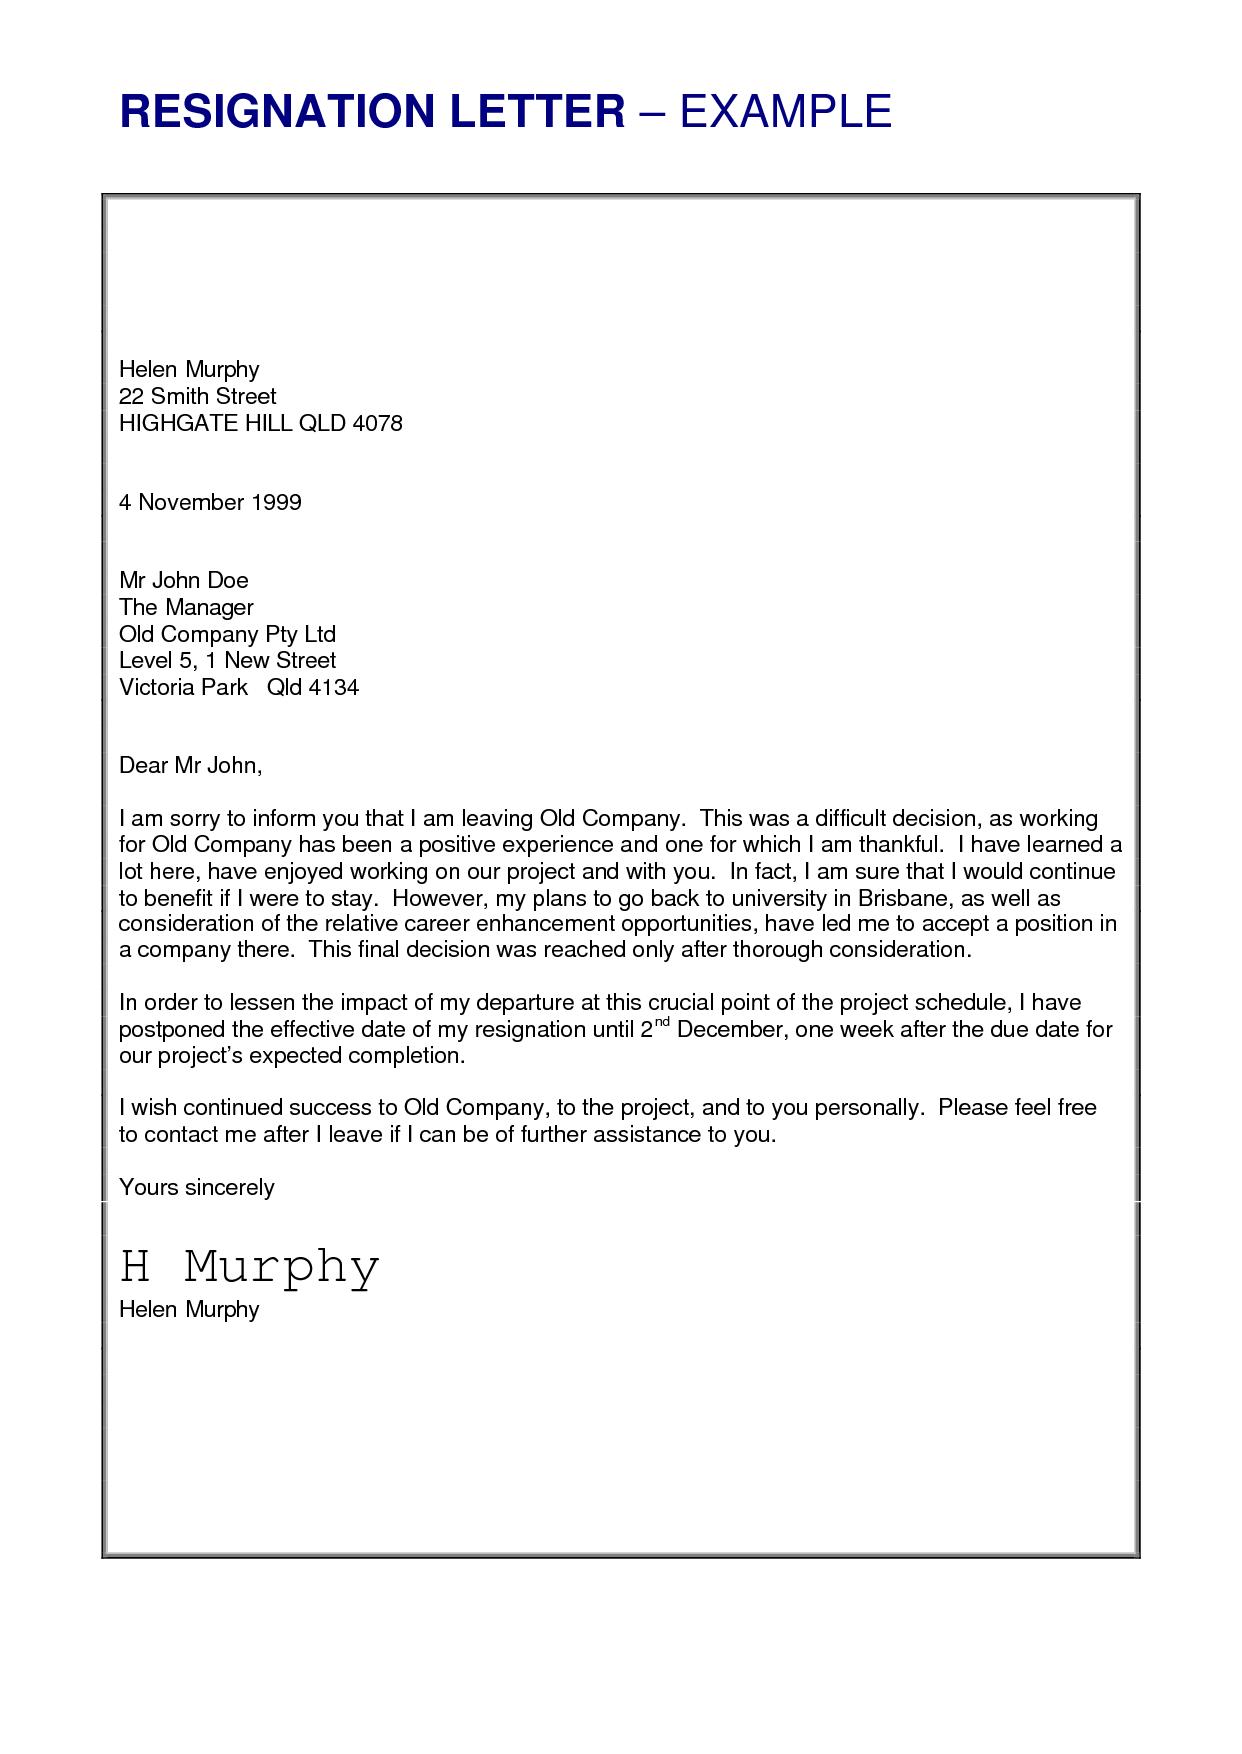 Job Resignation Letter Sample  Loganun Blog  Best Letter  Job resignation letter Resignation